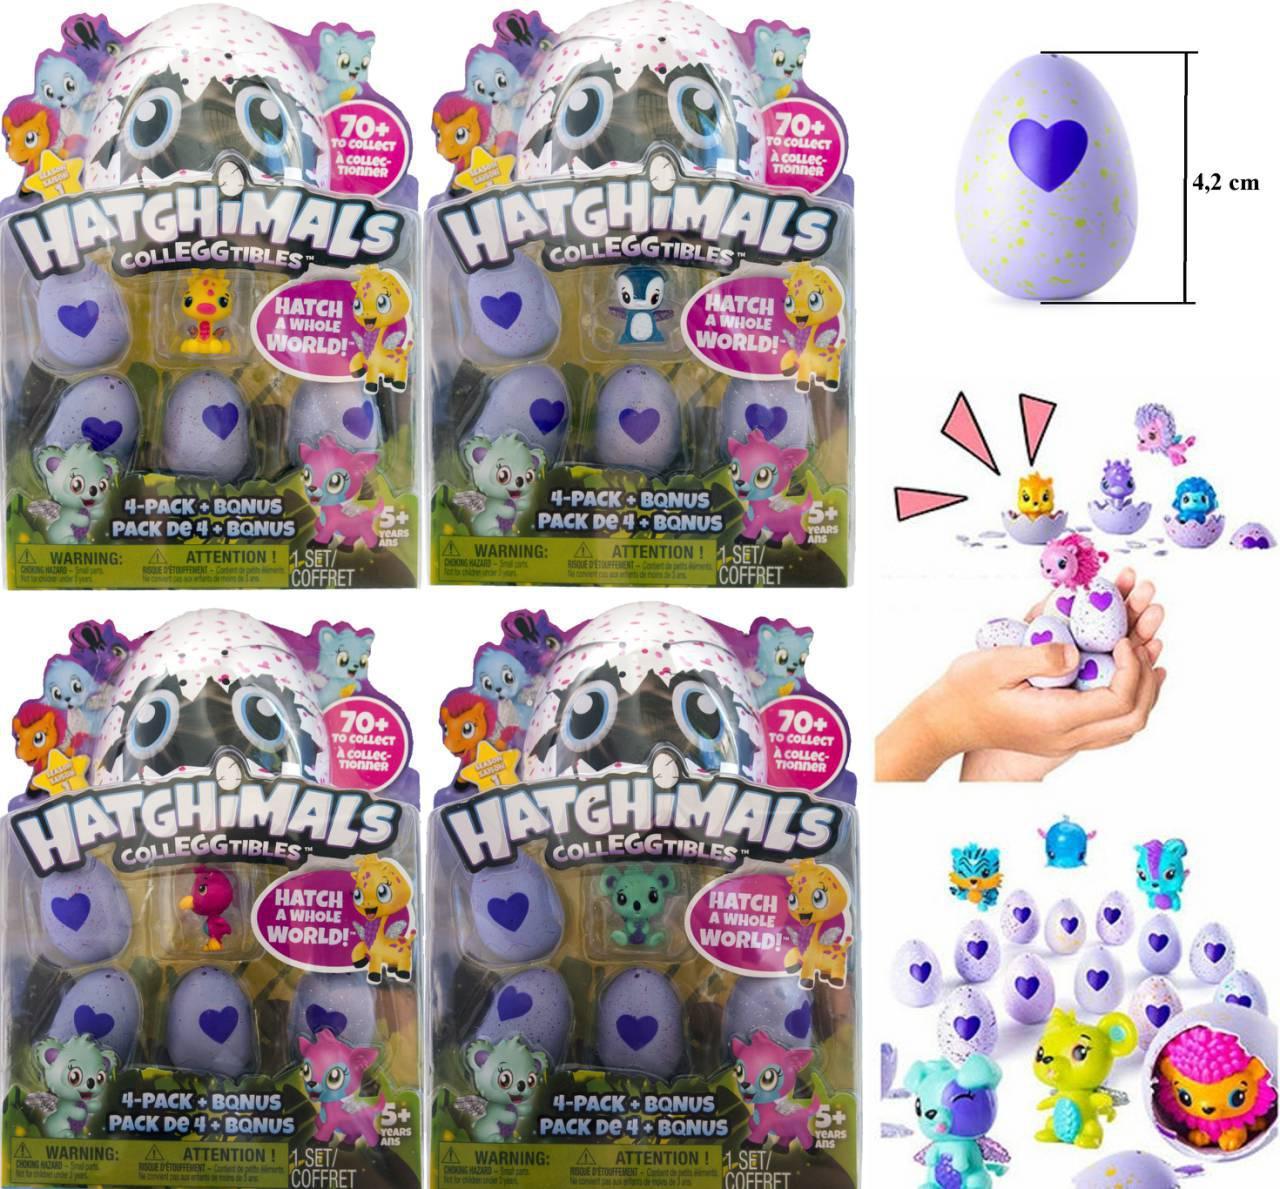 Игрушка Hatchimals Хэтчималс Хетчималс 4 яйца в наборе, 5 персонажей, яйца Хетчималс